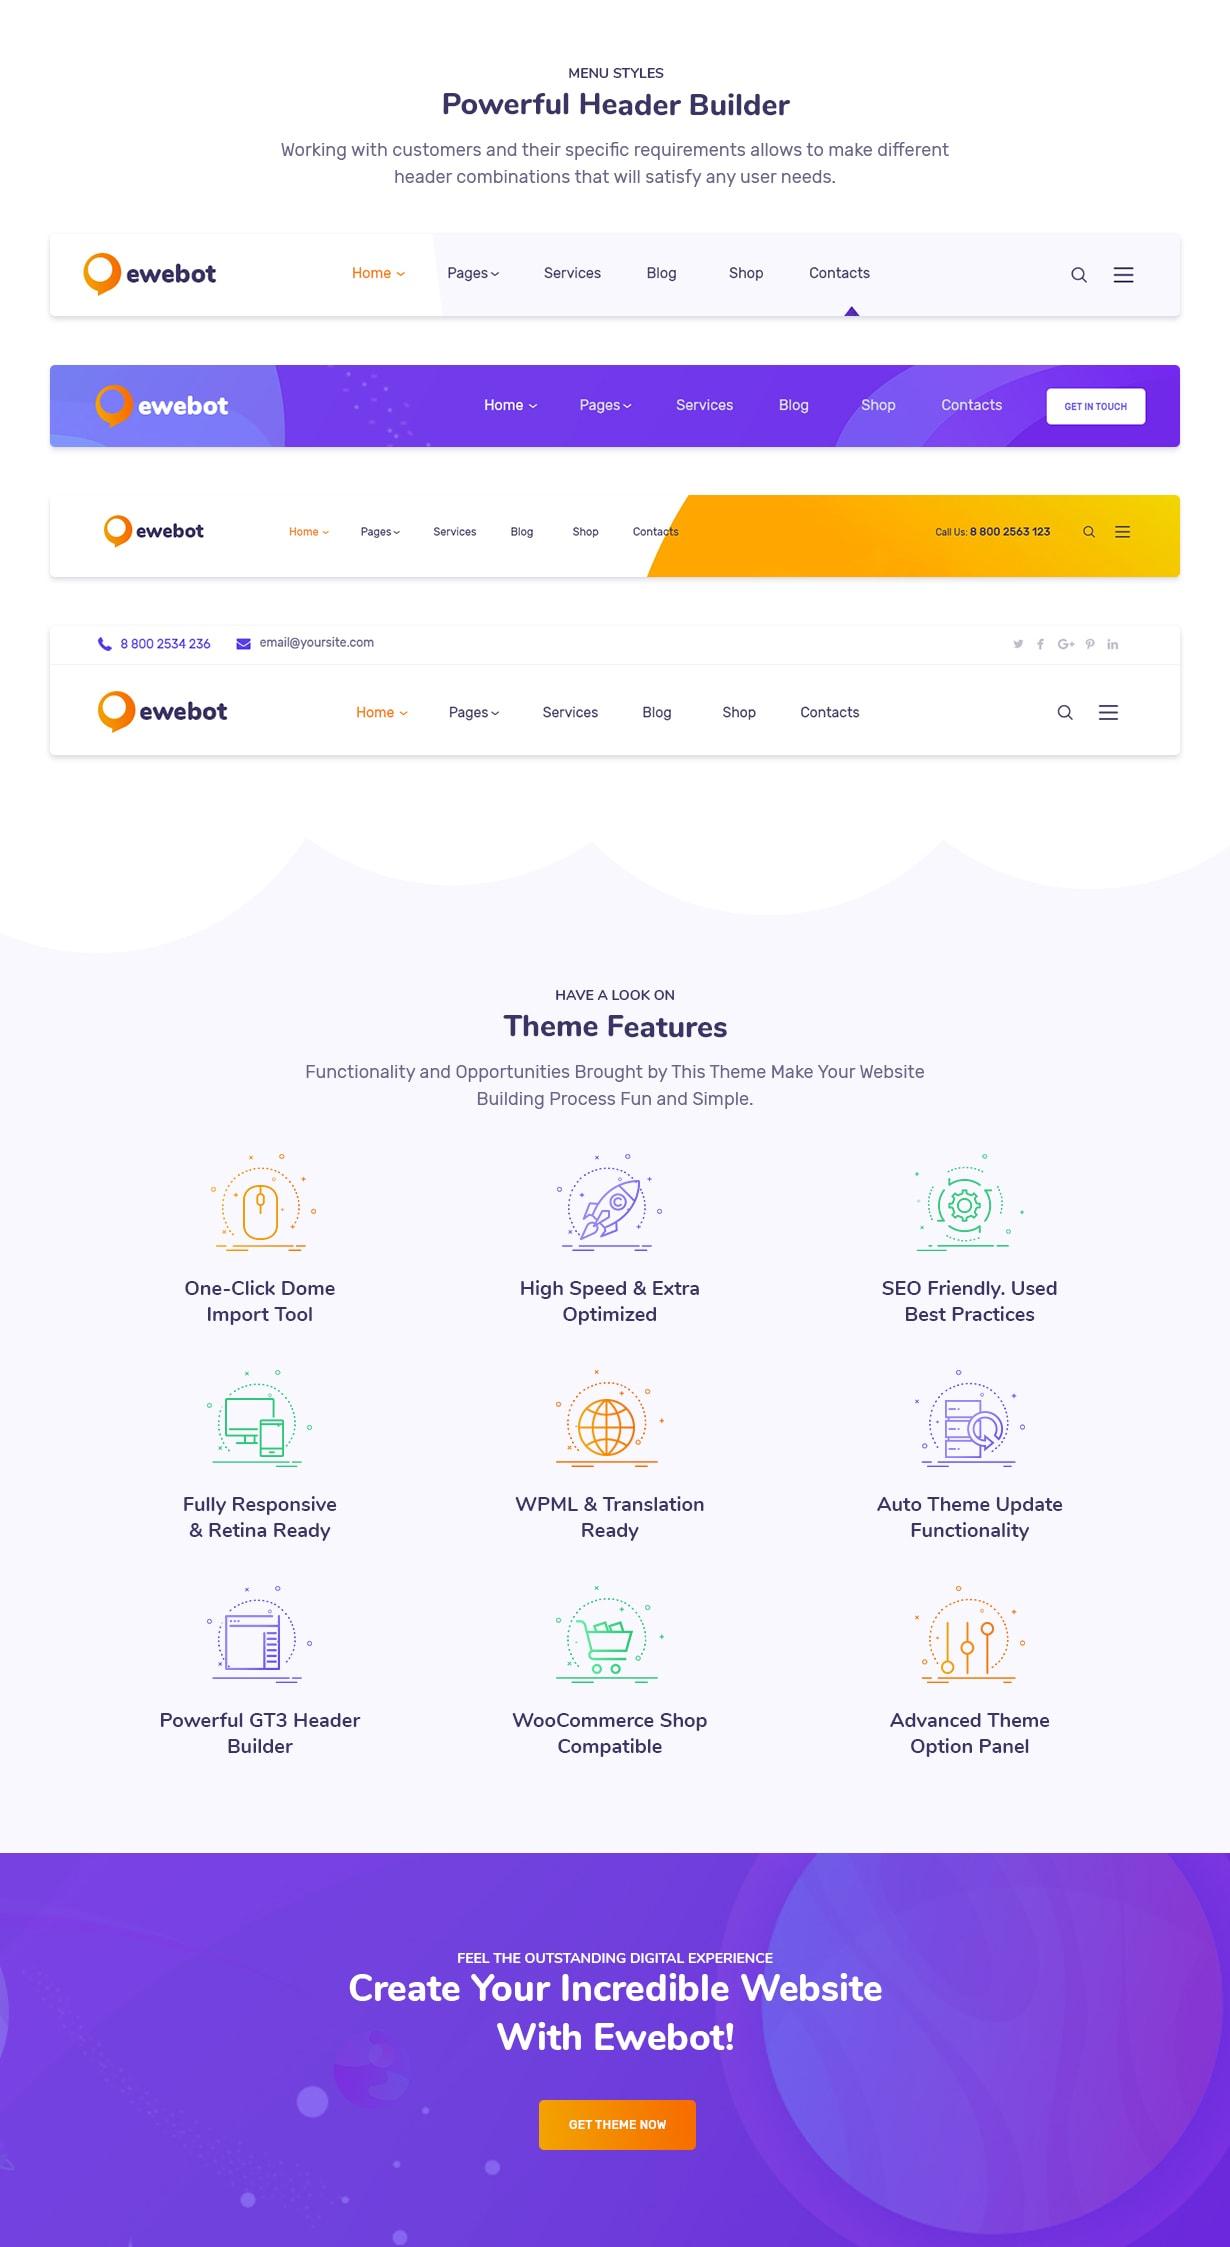 Ewebot - Marketing SEO Digital Agency - 7